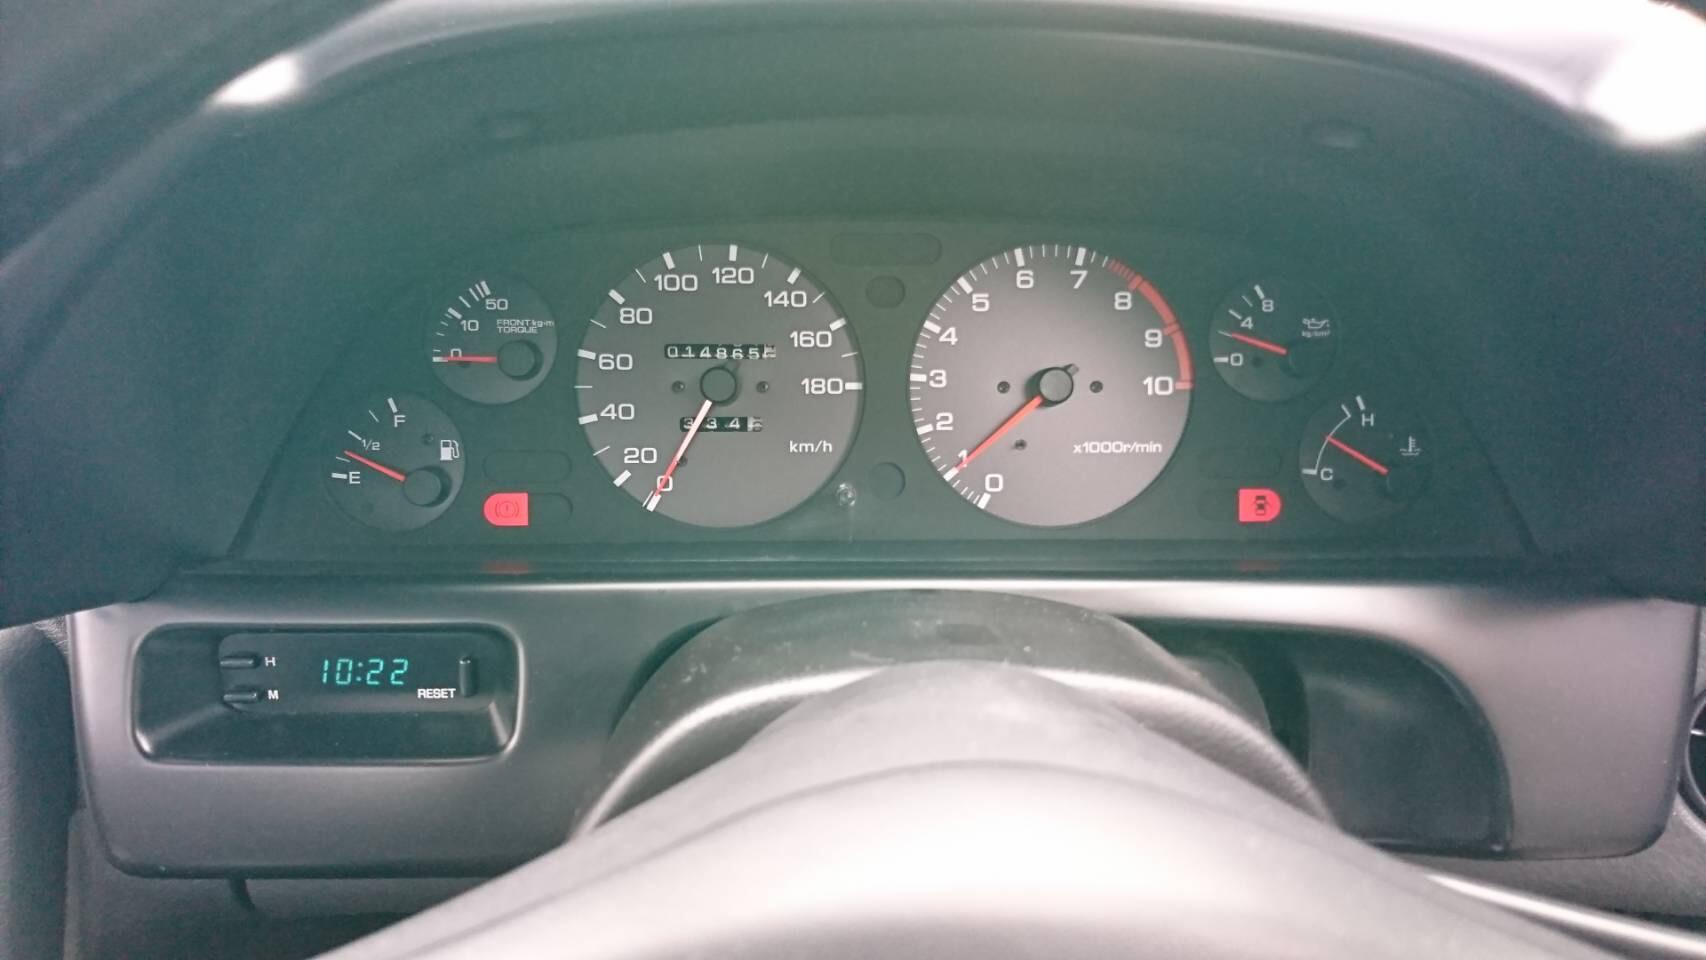 1992 Nissan Skyline R32 GTR odometer